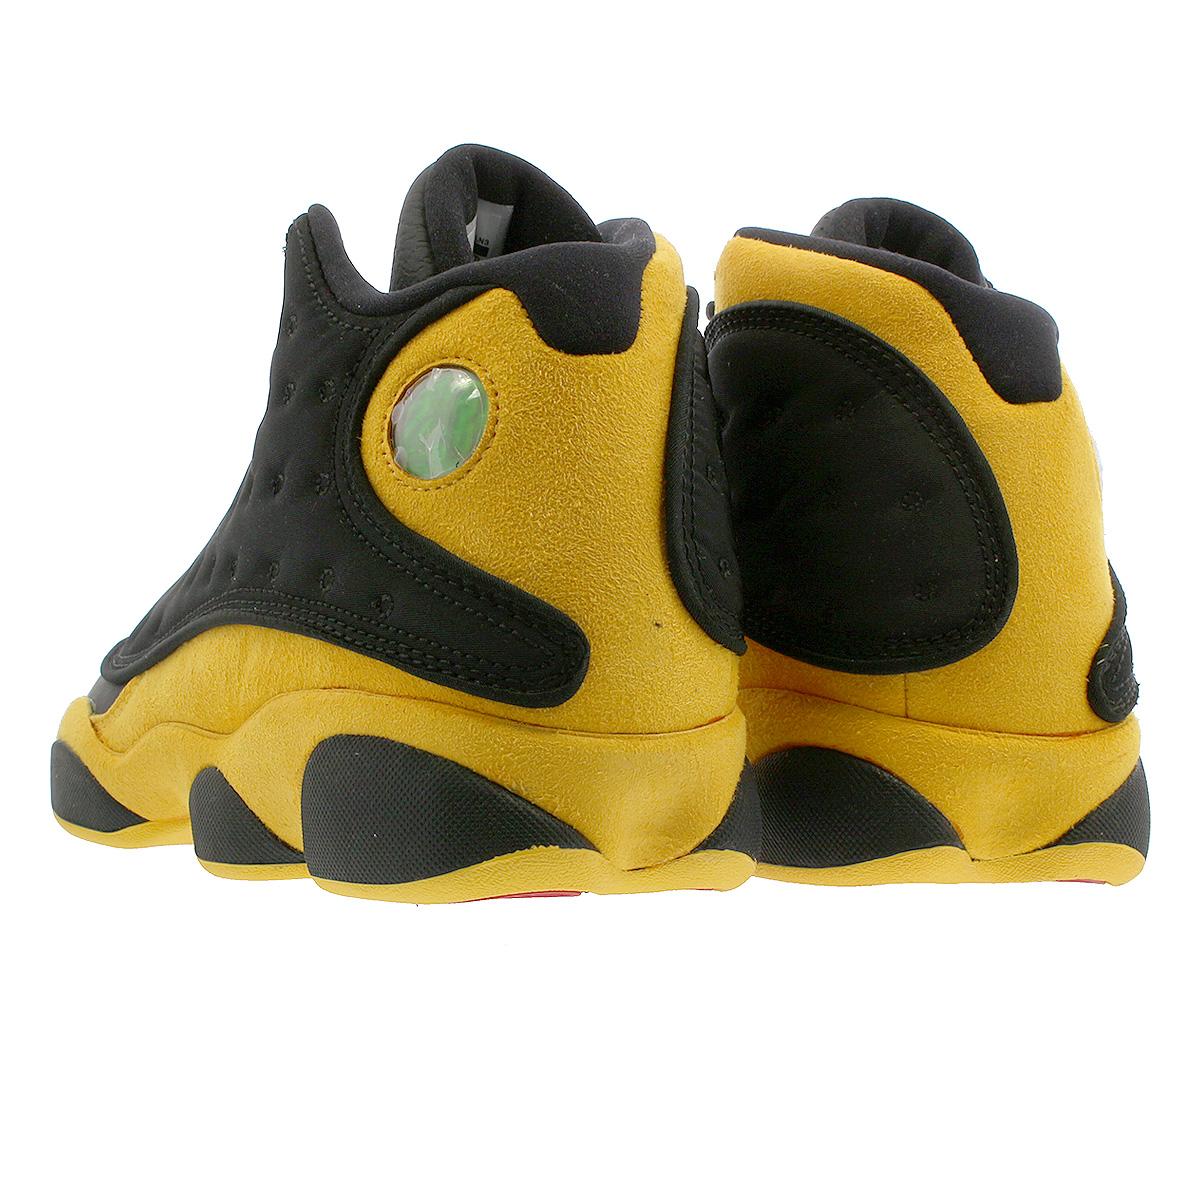 brand new ee2f2 3caa7 NIKE AIR JORDAN 13 RETRO Nike Air Jordan 13 nostalgic BLACK/UNIVERSITY  RED/UNIVERSITY GOLD 414,571-035